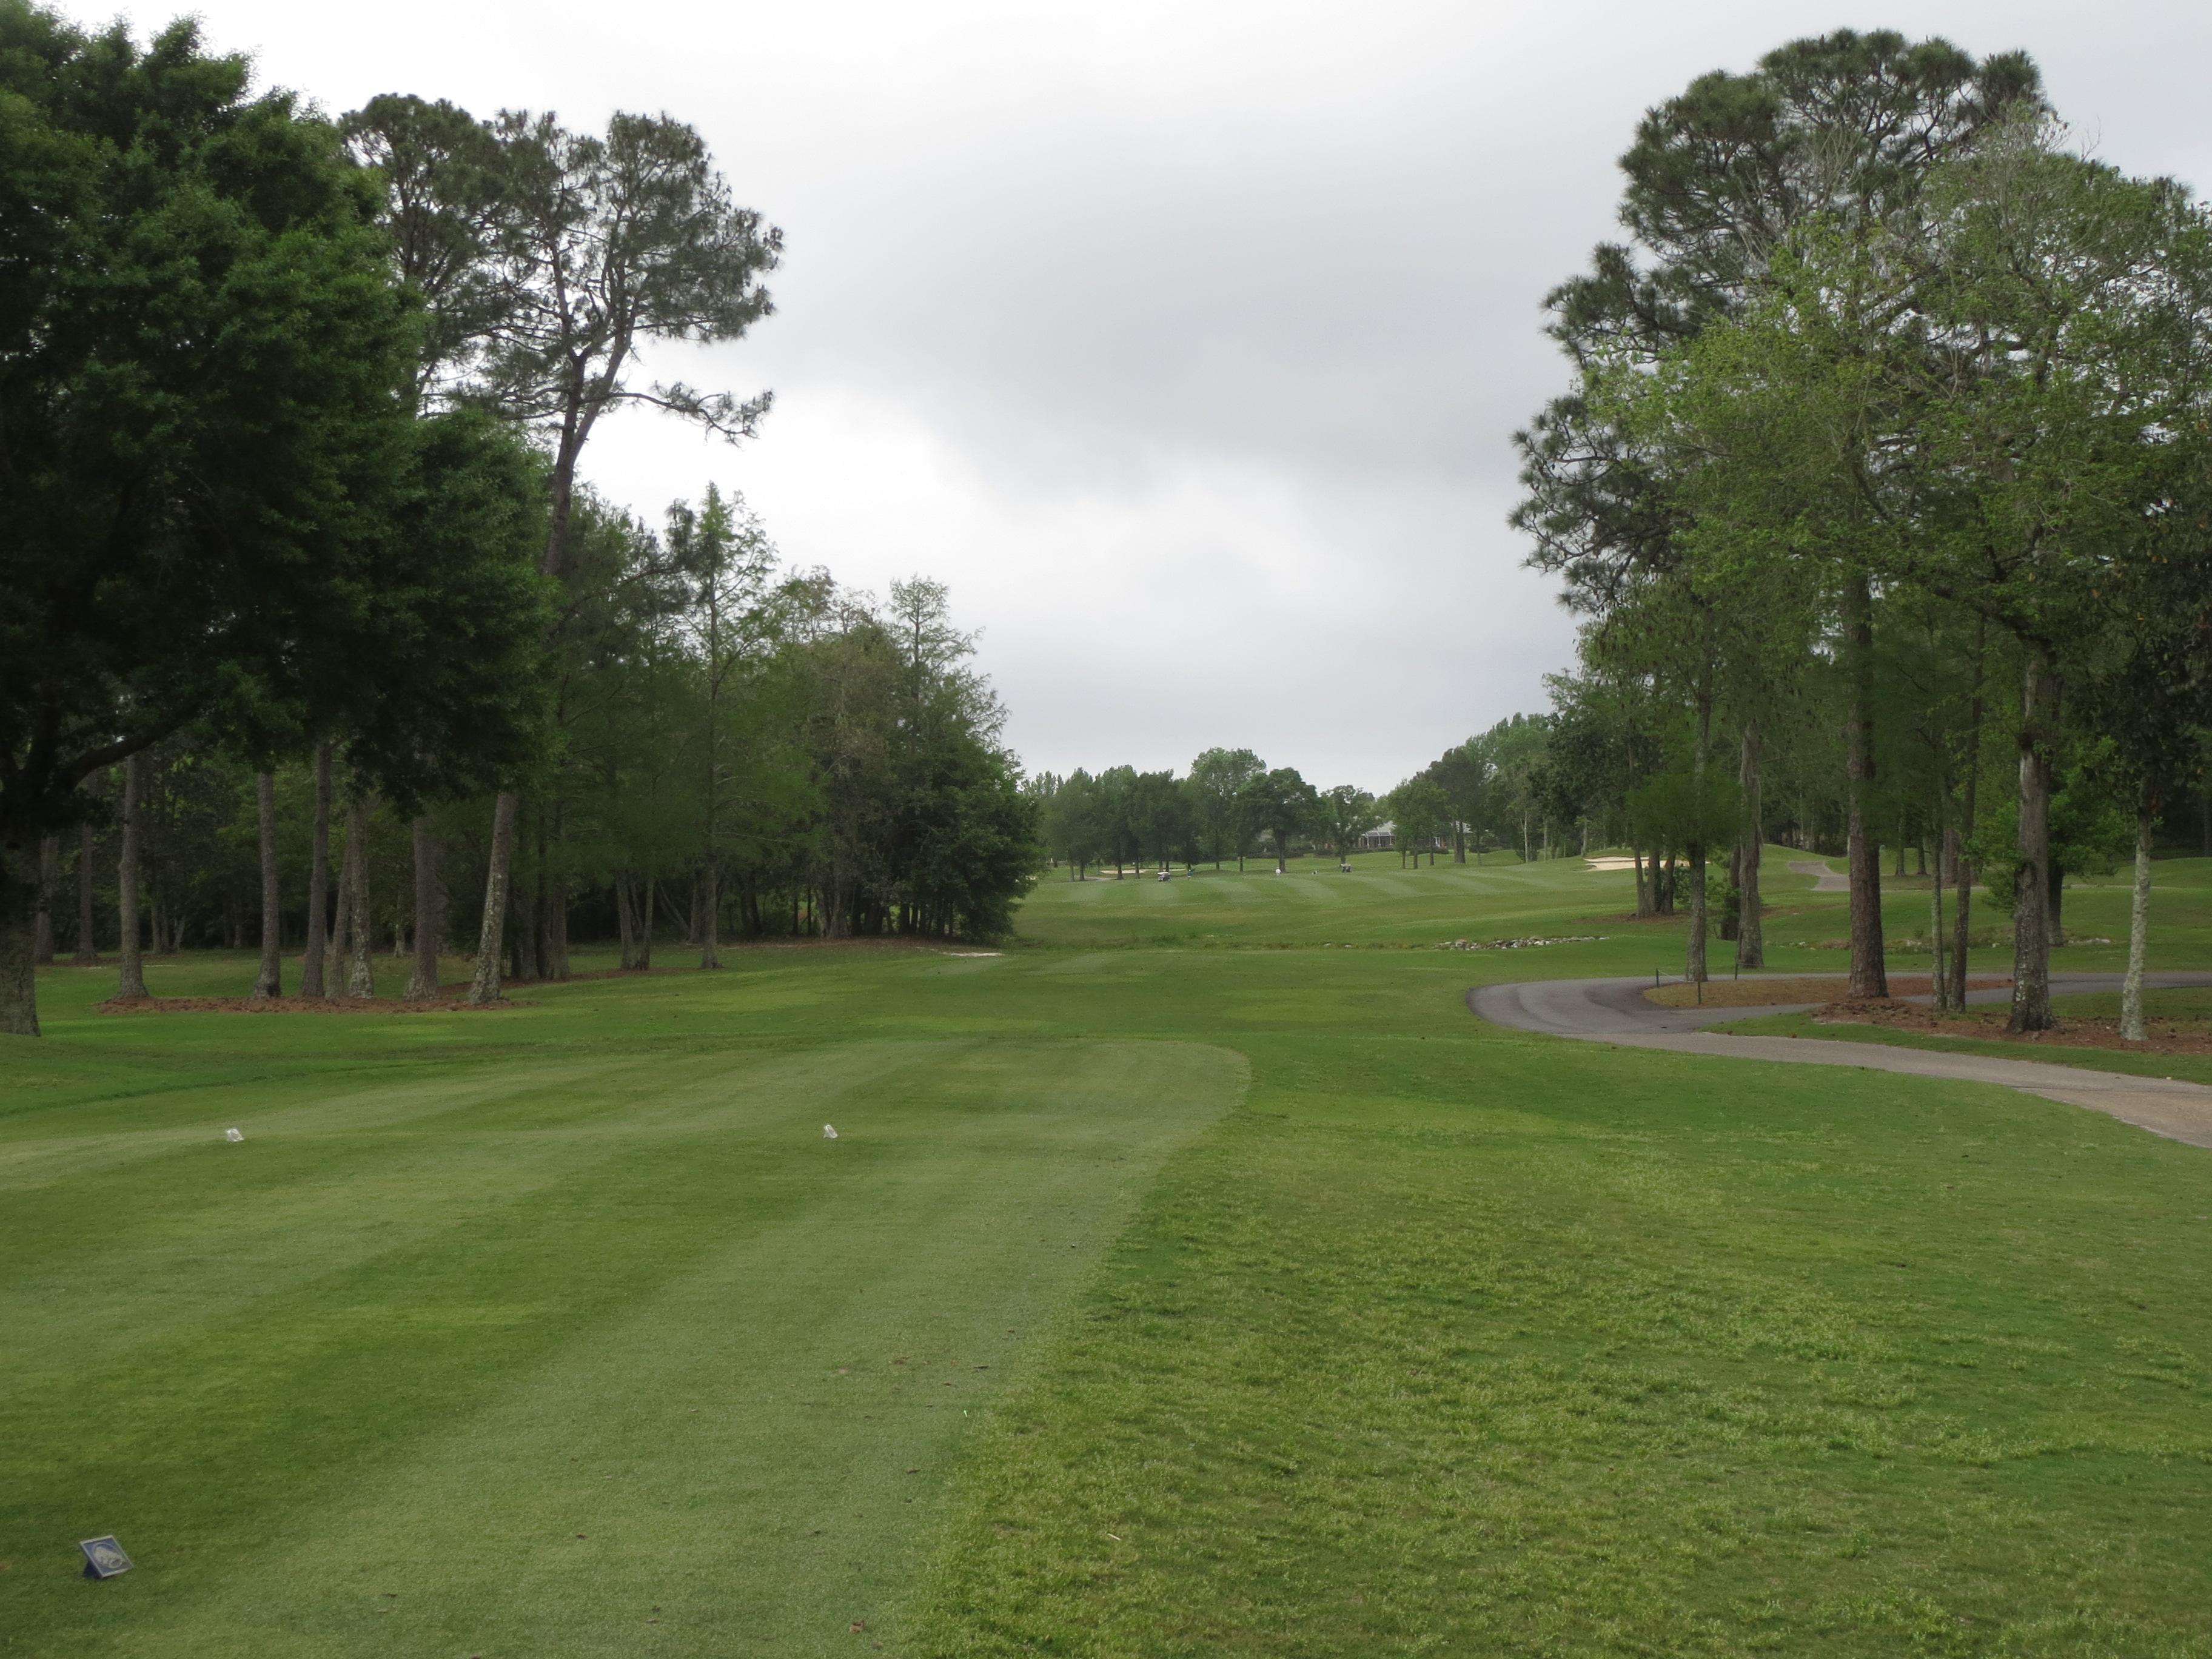 Golf destination gulf shores al wiscogolfaddict for Craft farms gulf shores al